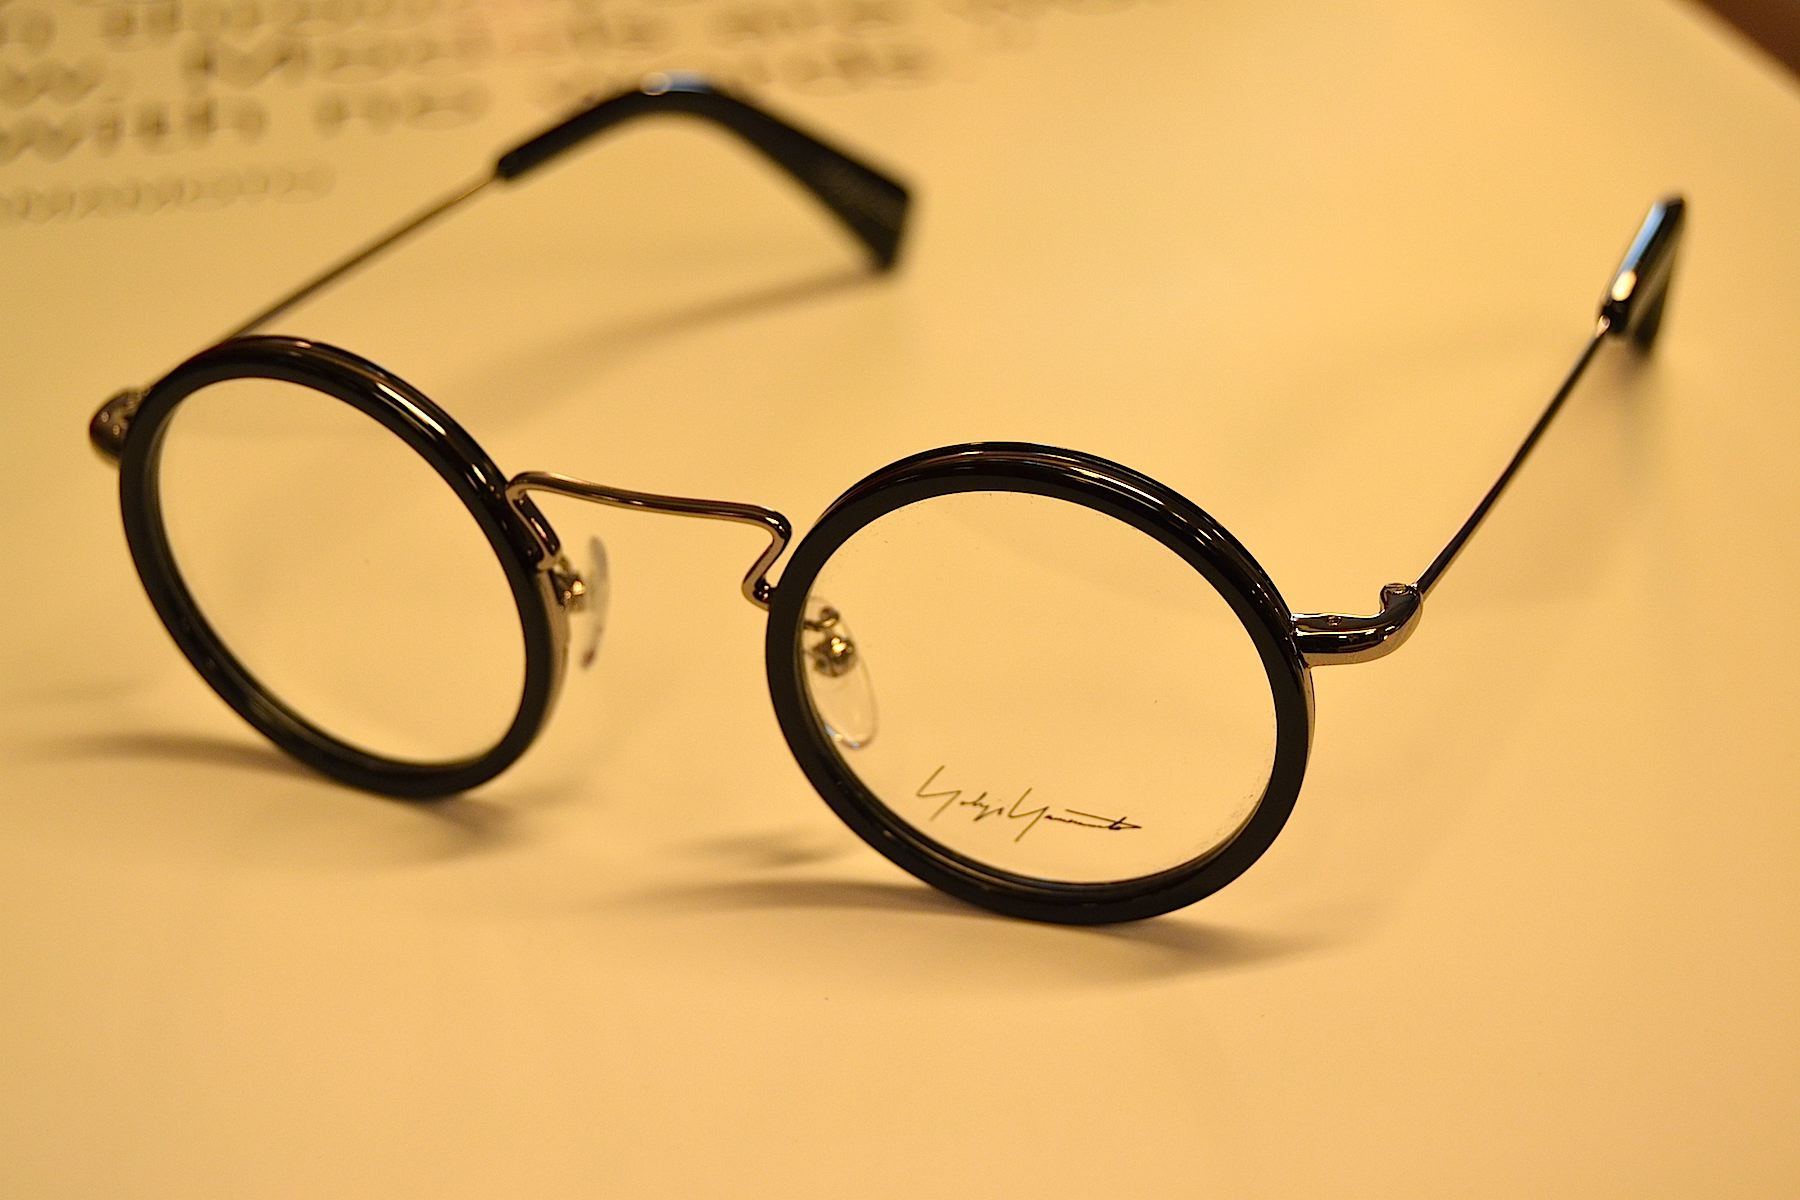 lenastore-bergamo-lenafashion-shop-online-yohji-yamamoto-gli-occhiali-sunglasses-15